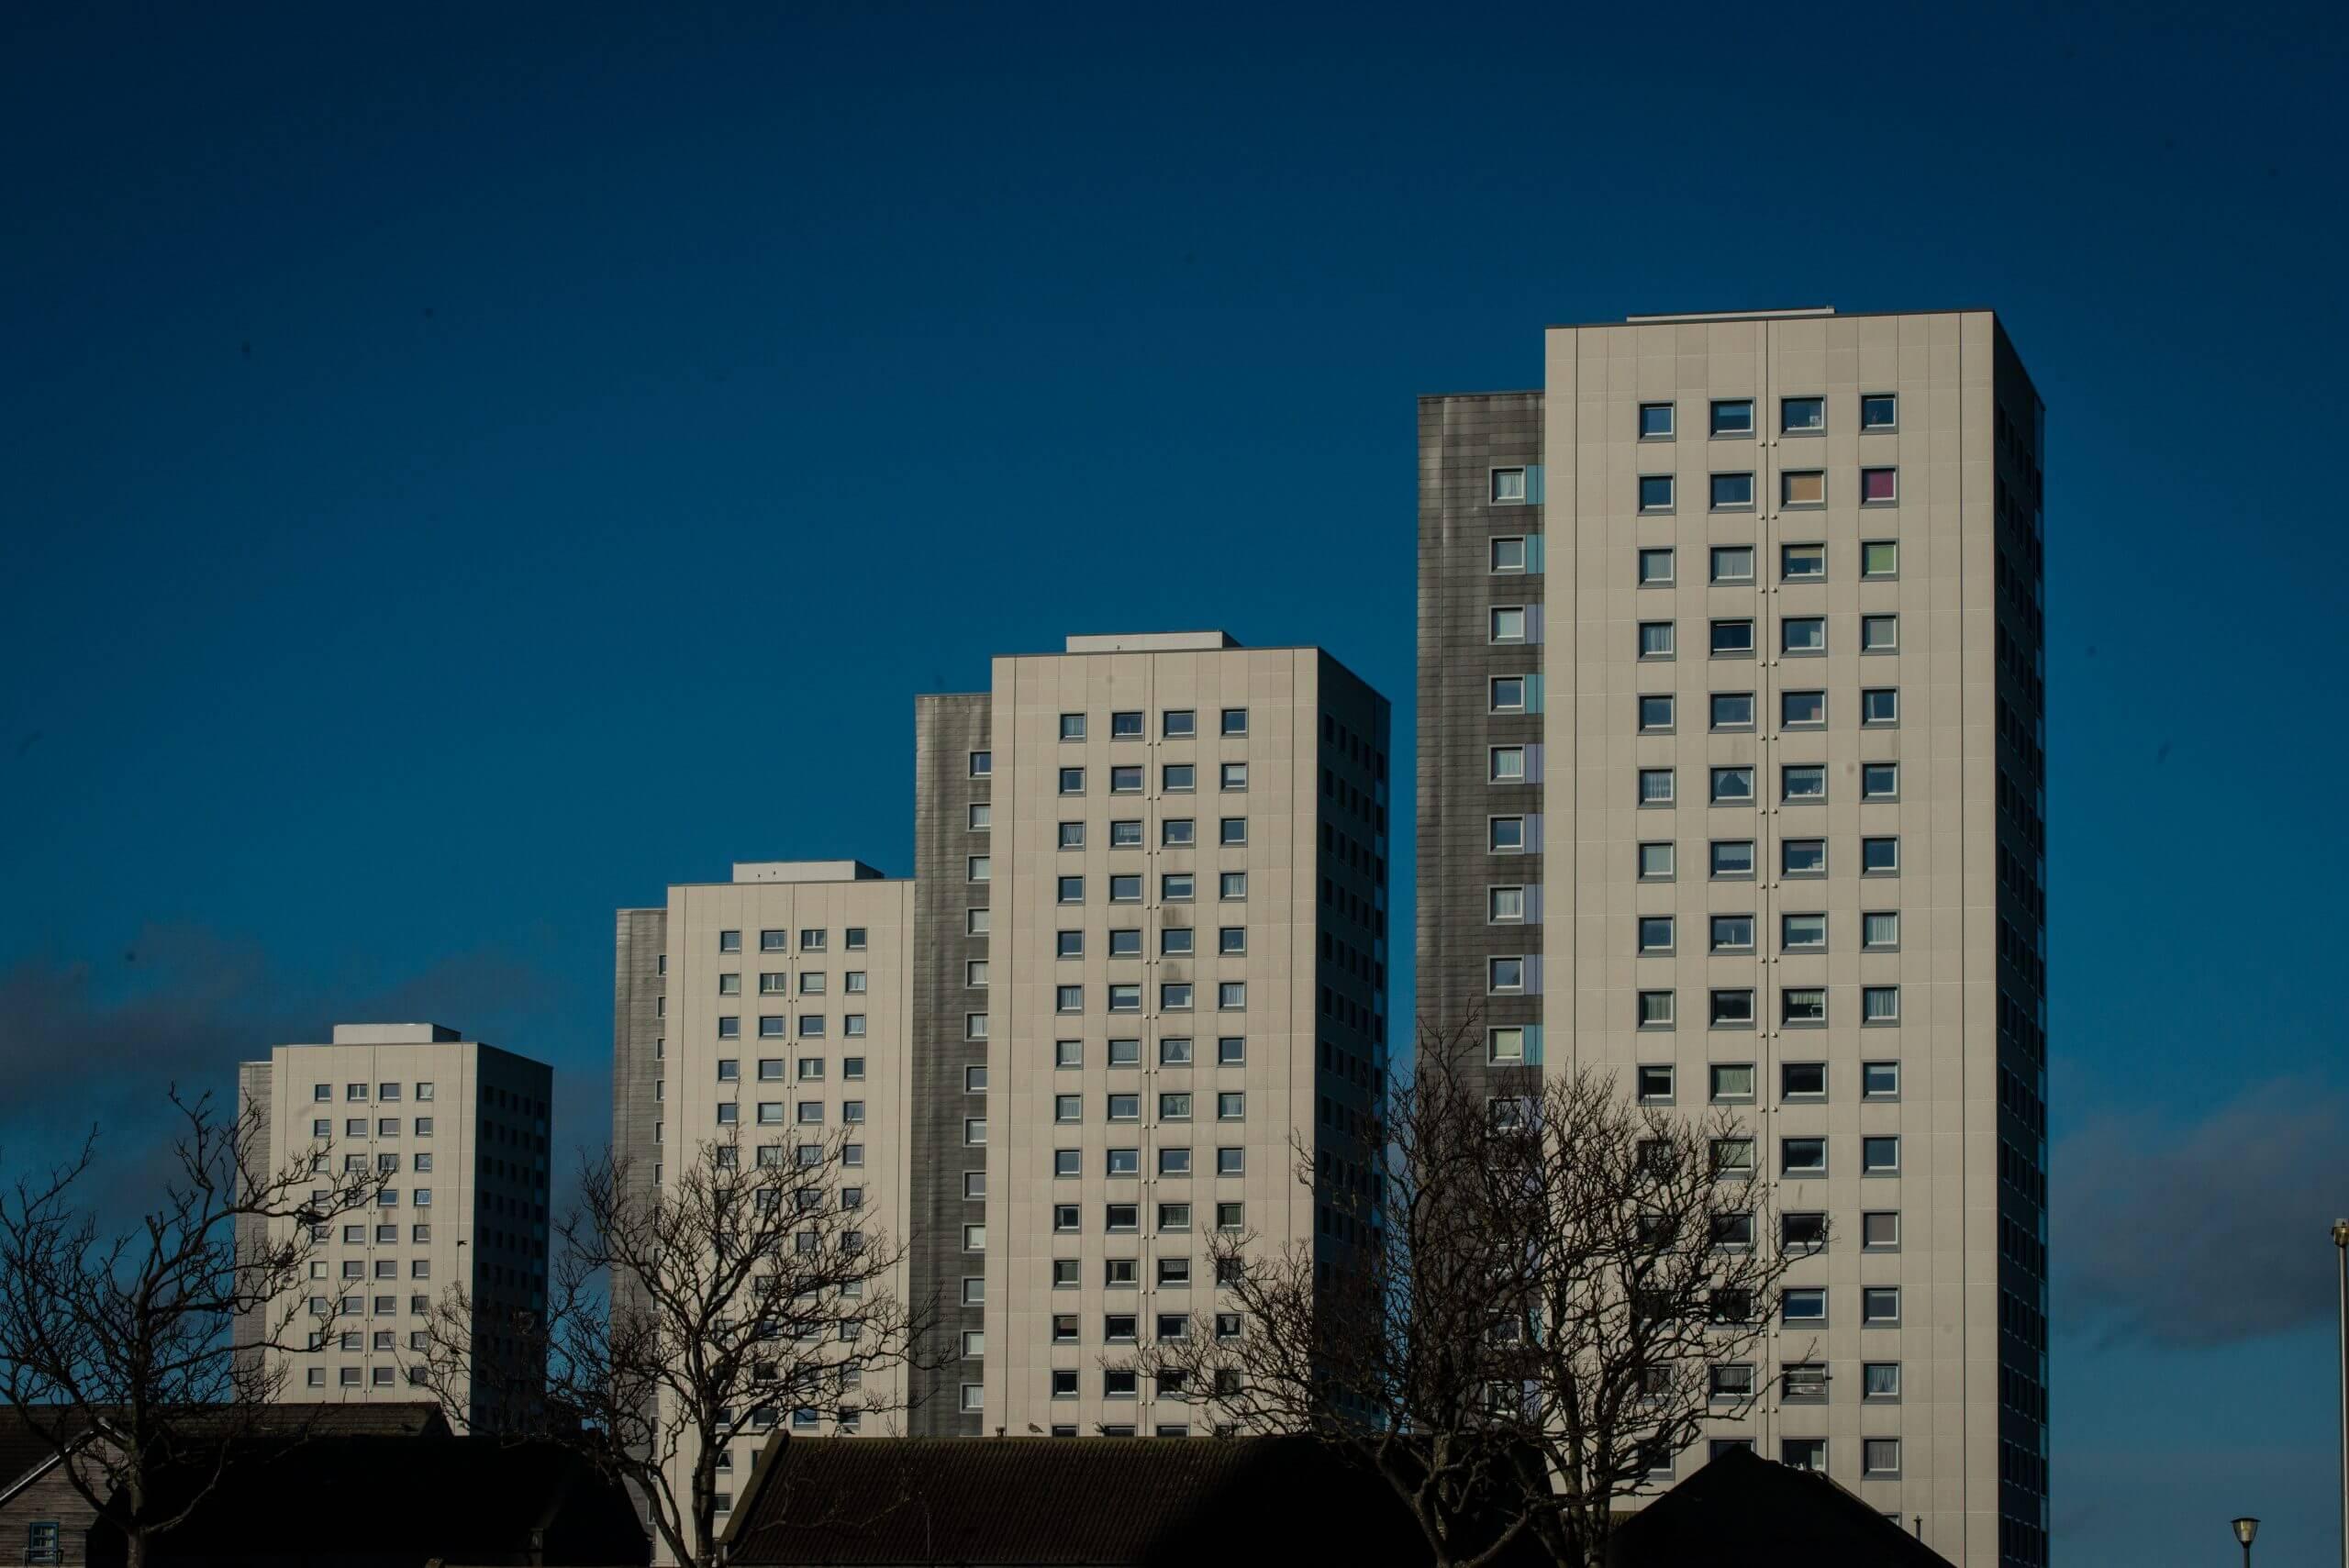 Multi-storey buildings in Aberdeen